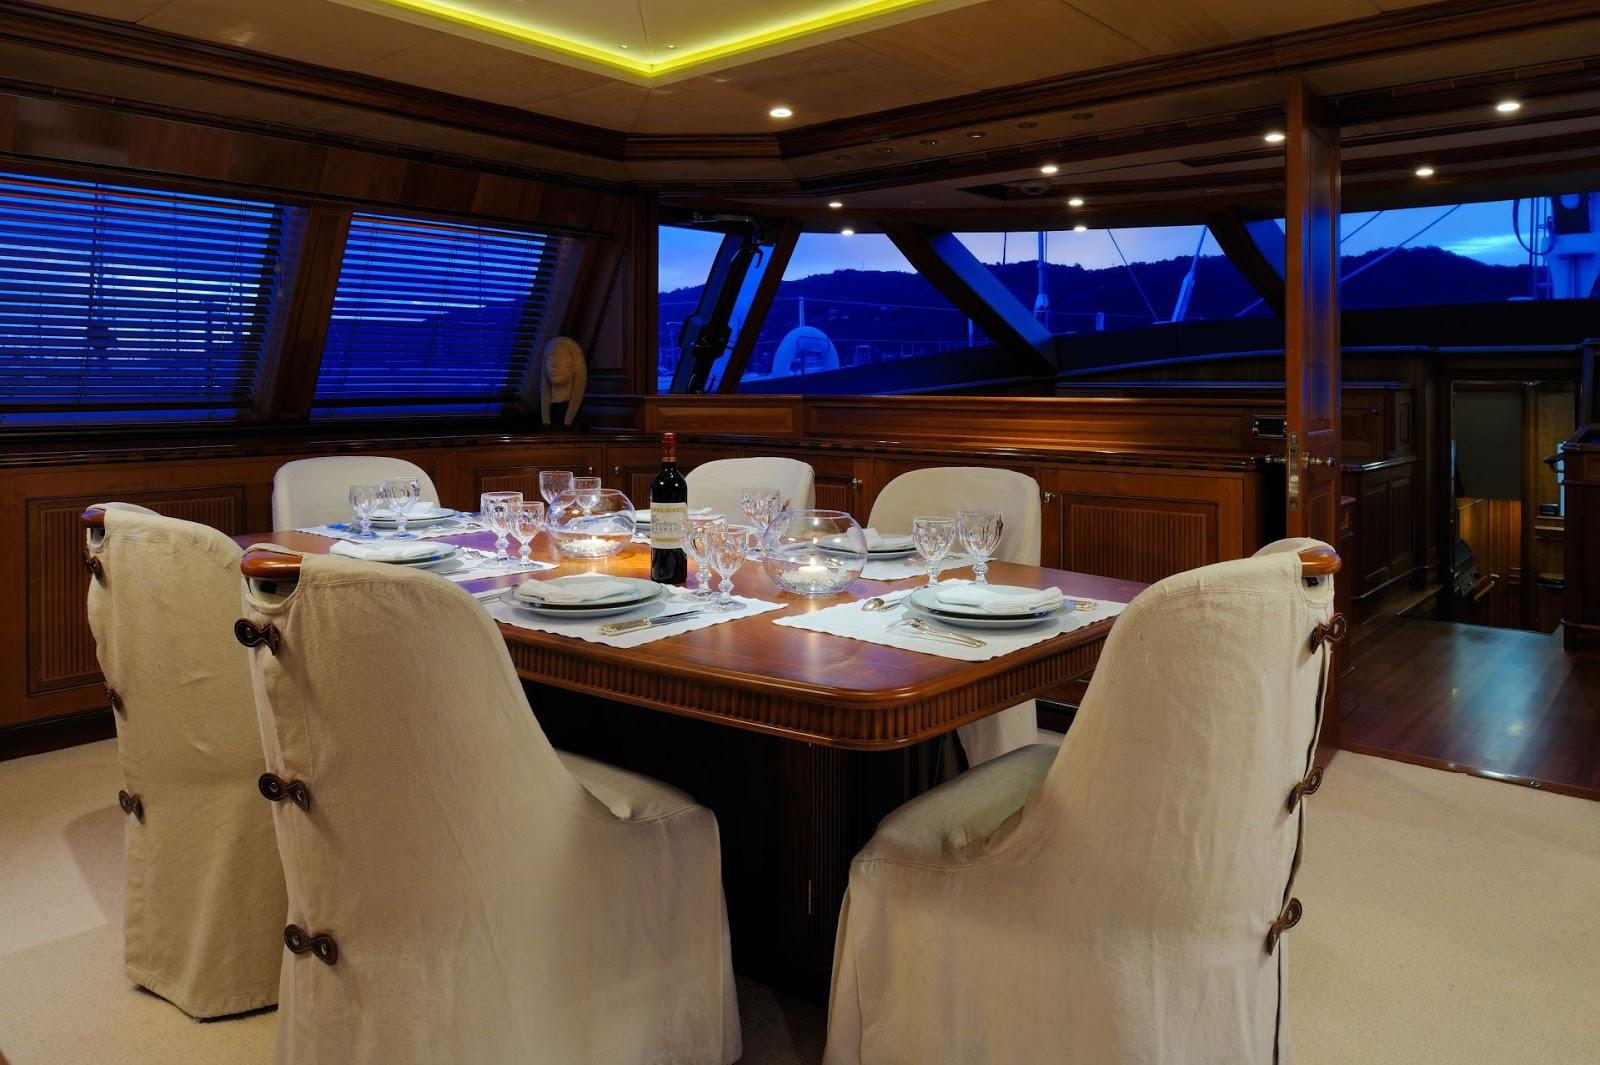 alquiler de veleros en ibiza. alquiler veleros ibiza. alquiler de veleros en ibiza. alquiler veleros ibiza. alquilar veleros en ibiza. velero de alquiler en ibiza